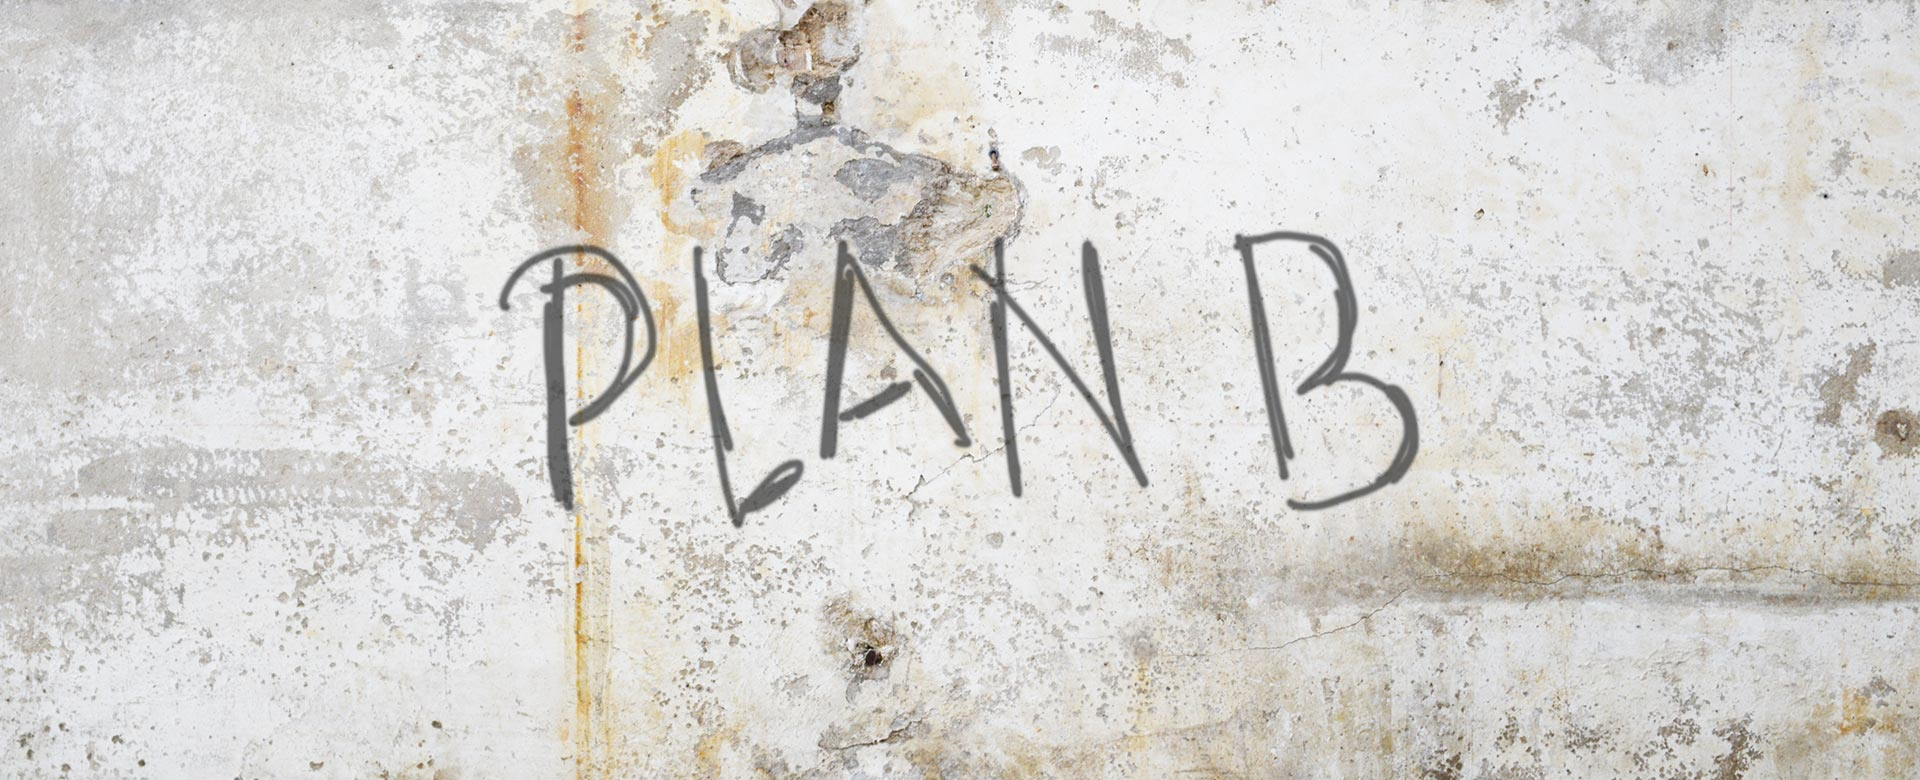 werkstattwegziel_plan-b